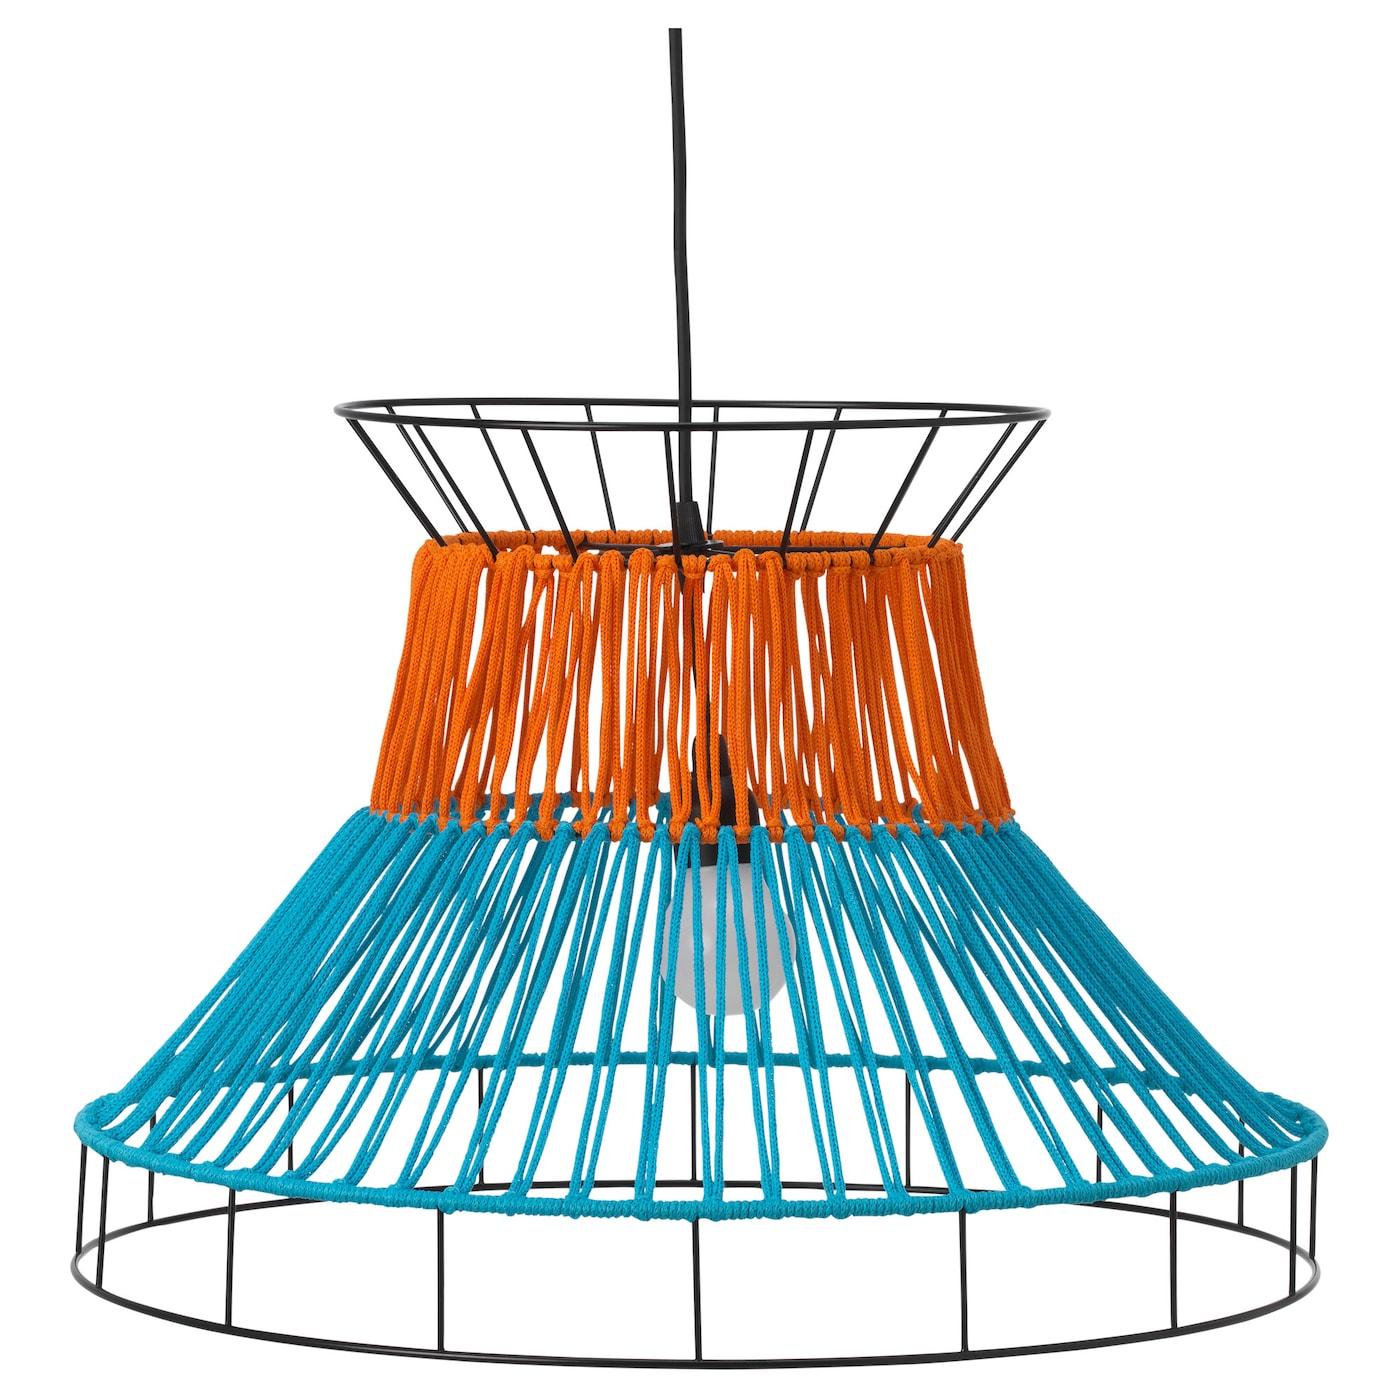 Solvinden led pendant lamp orangeblue outdoor 55 cm ikea ikea solvinden led pendant lamp aloadofball Images